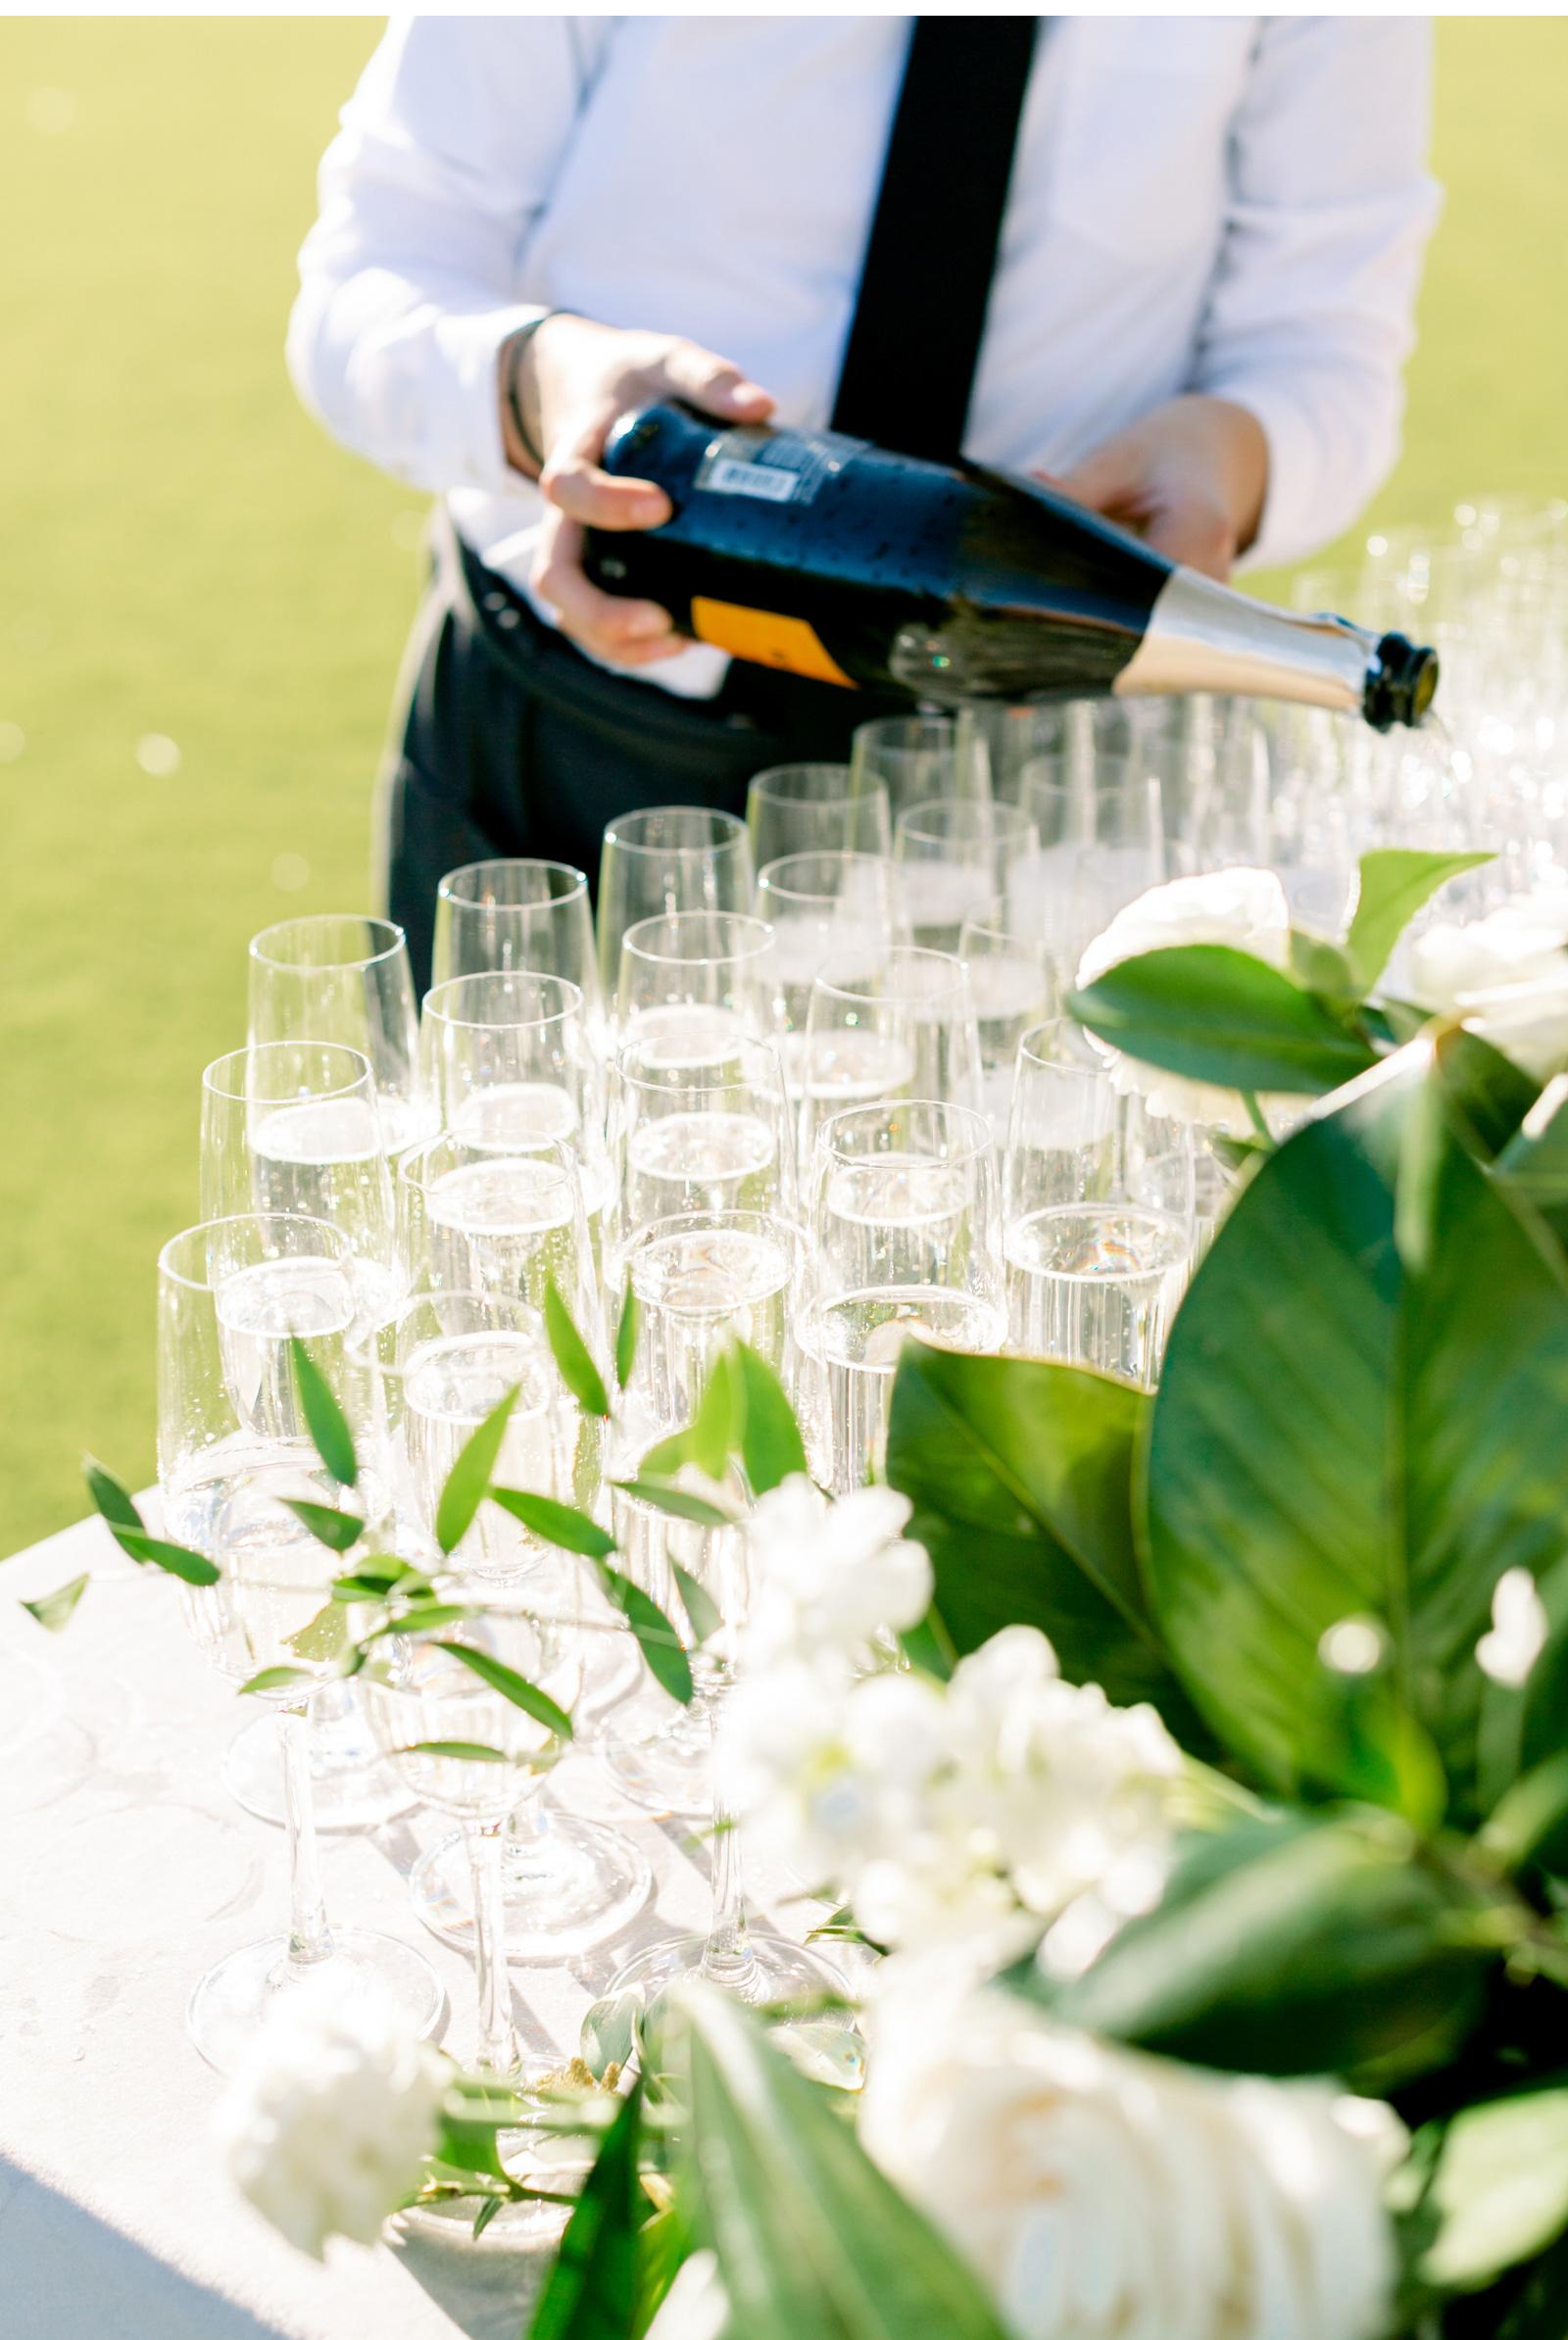 Malibu-Wedding-Venue-Photographer-Southern-California-Fine-Art-Wedding-Photo-Style-Me-Pretty-Natalie-Schutt-Photography_04.jpg